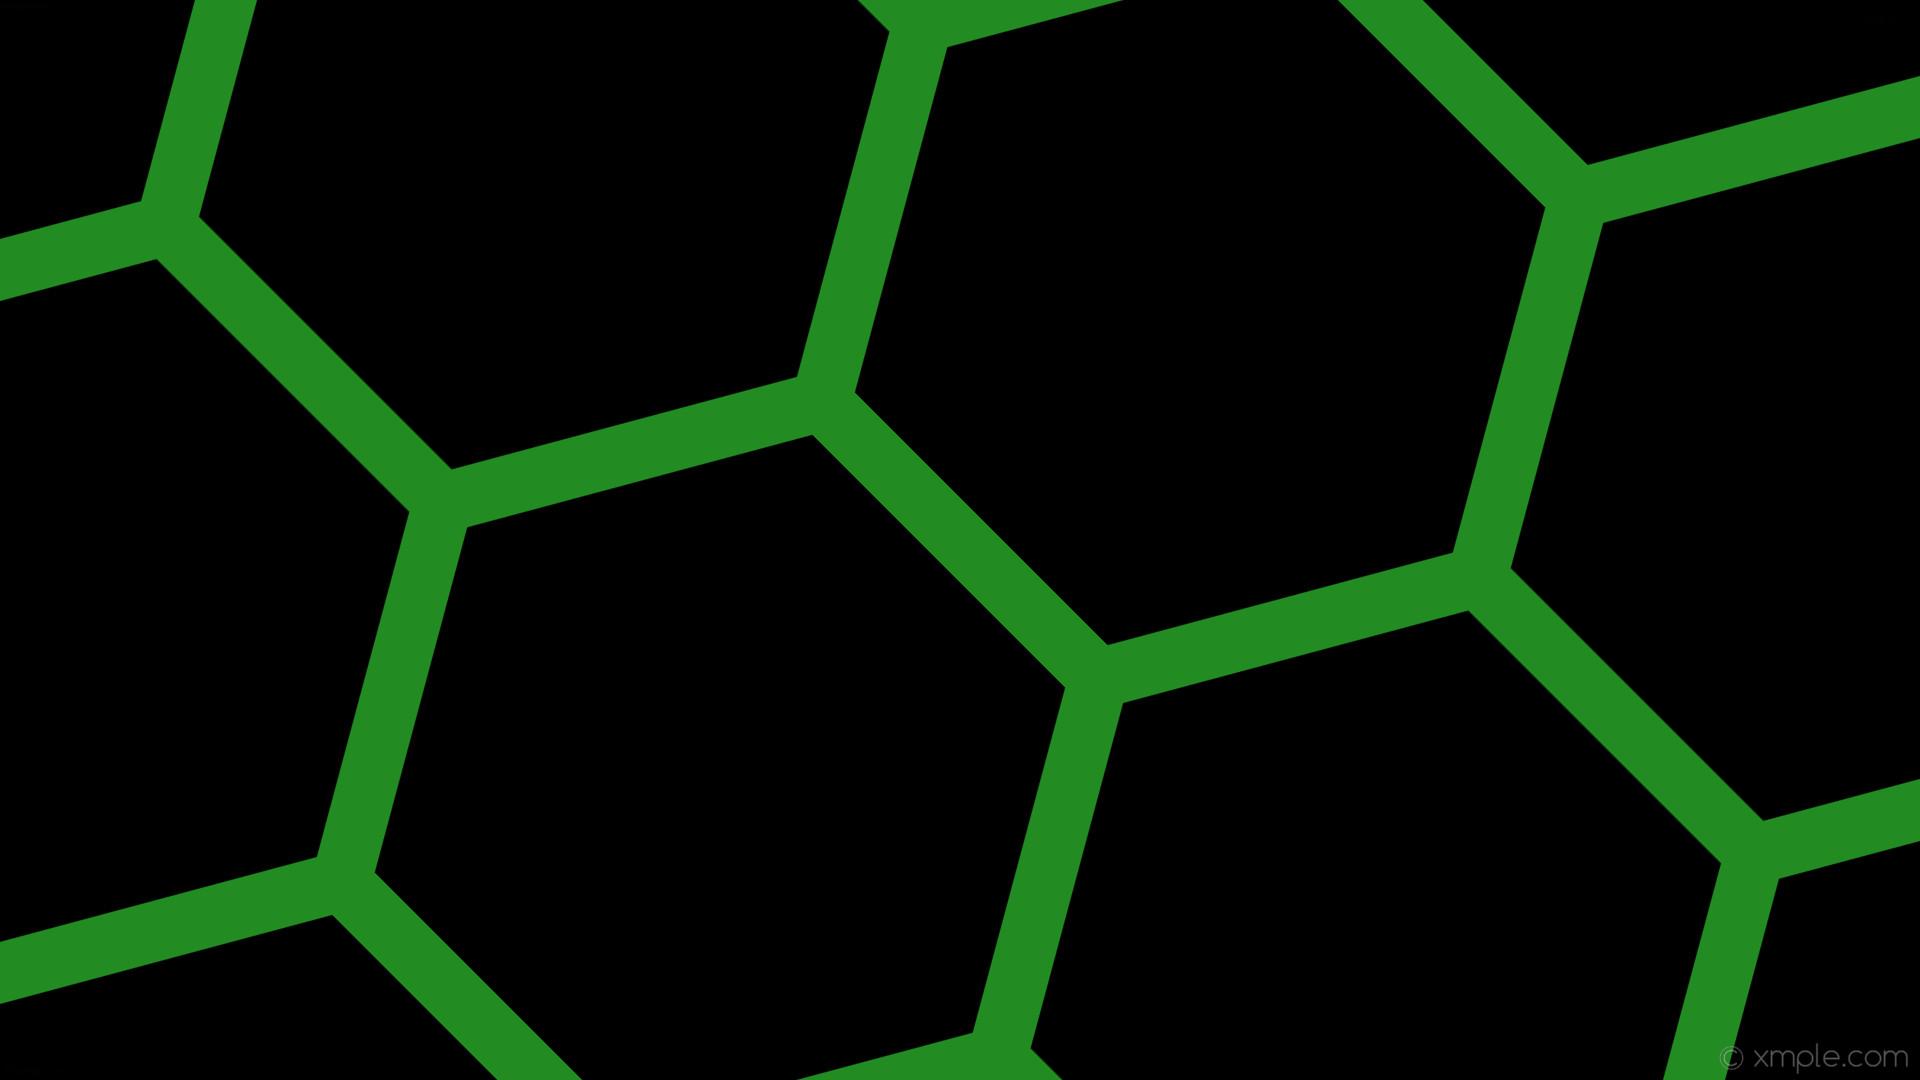 wallpaper beehive green drop shadow black hexagon forest green #228b22  #000000 160° 60px